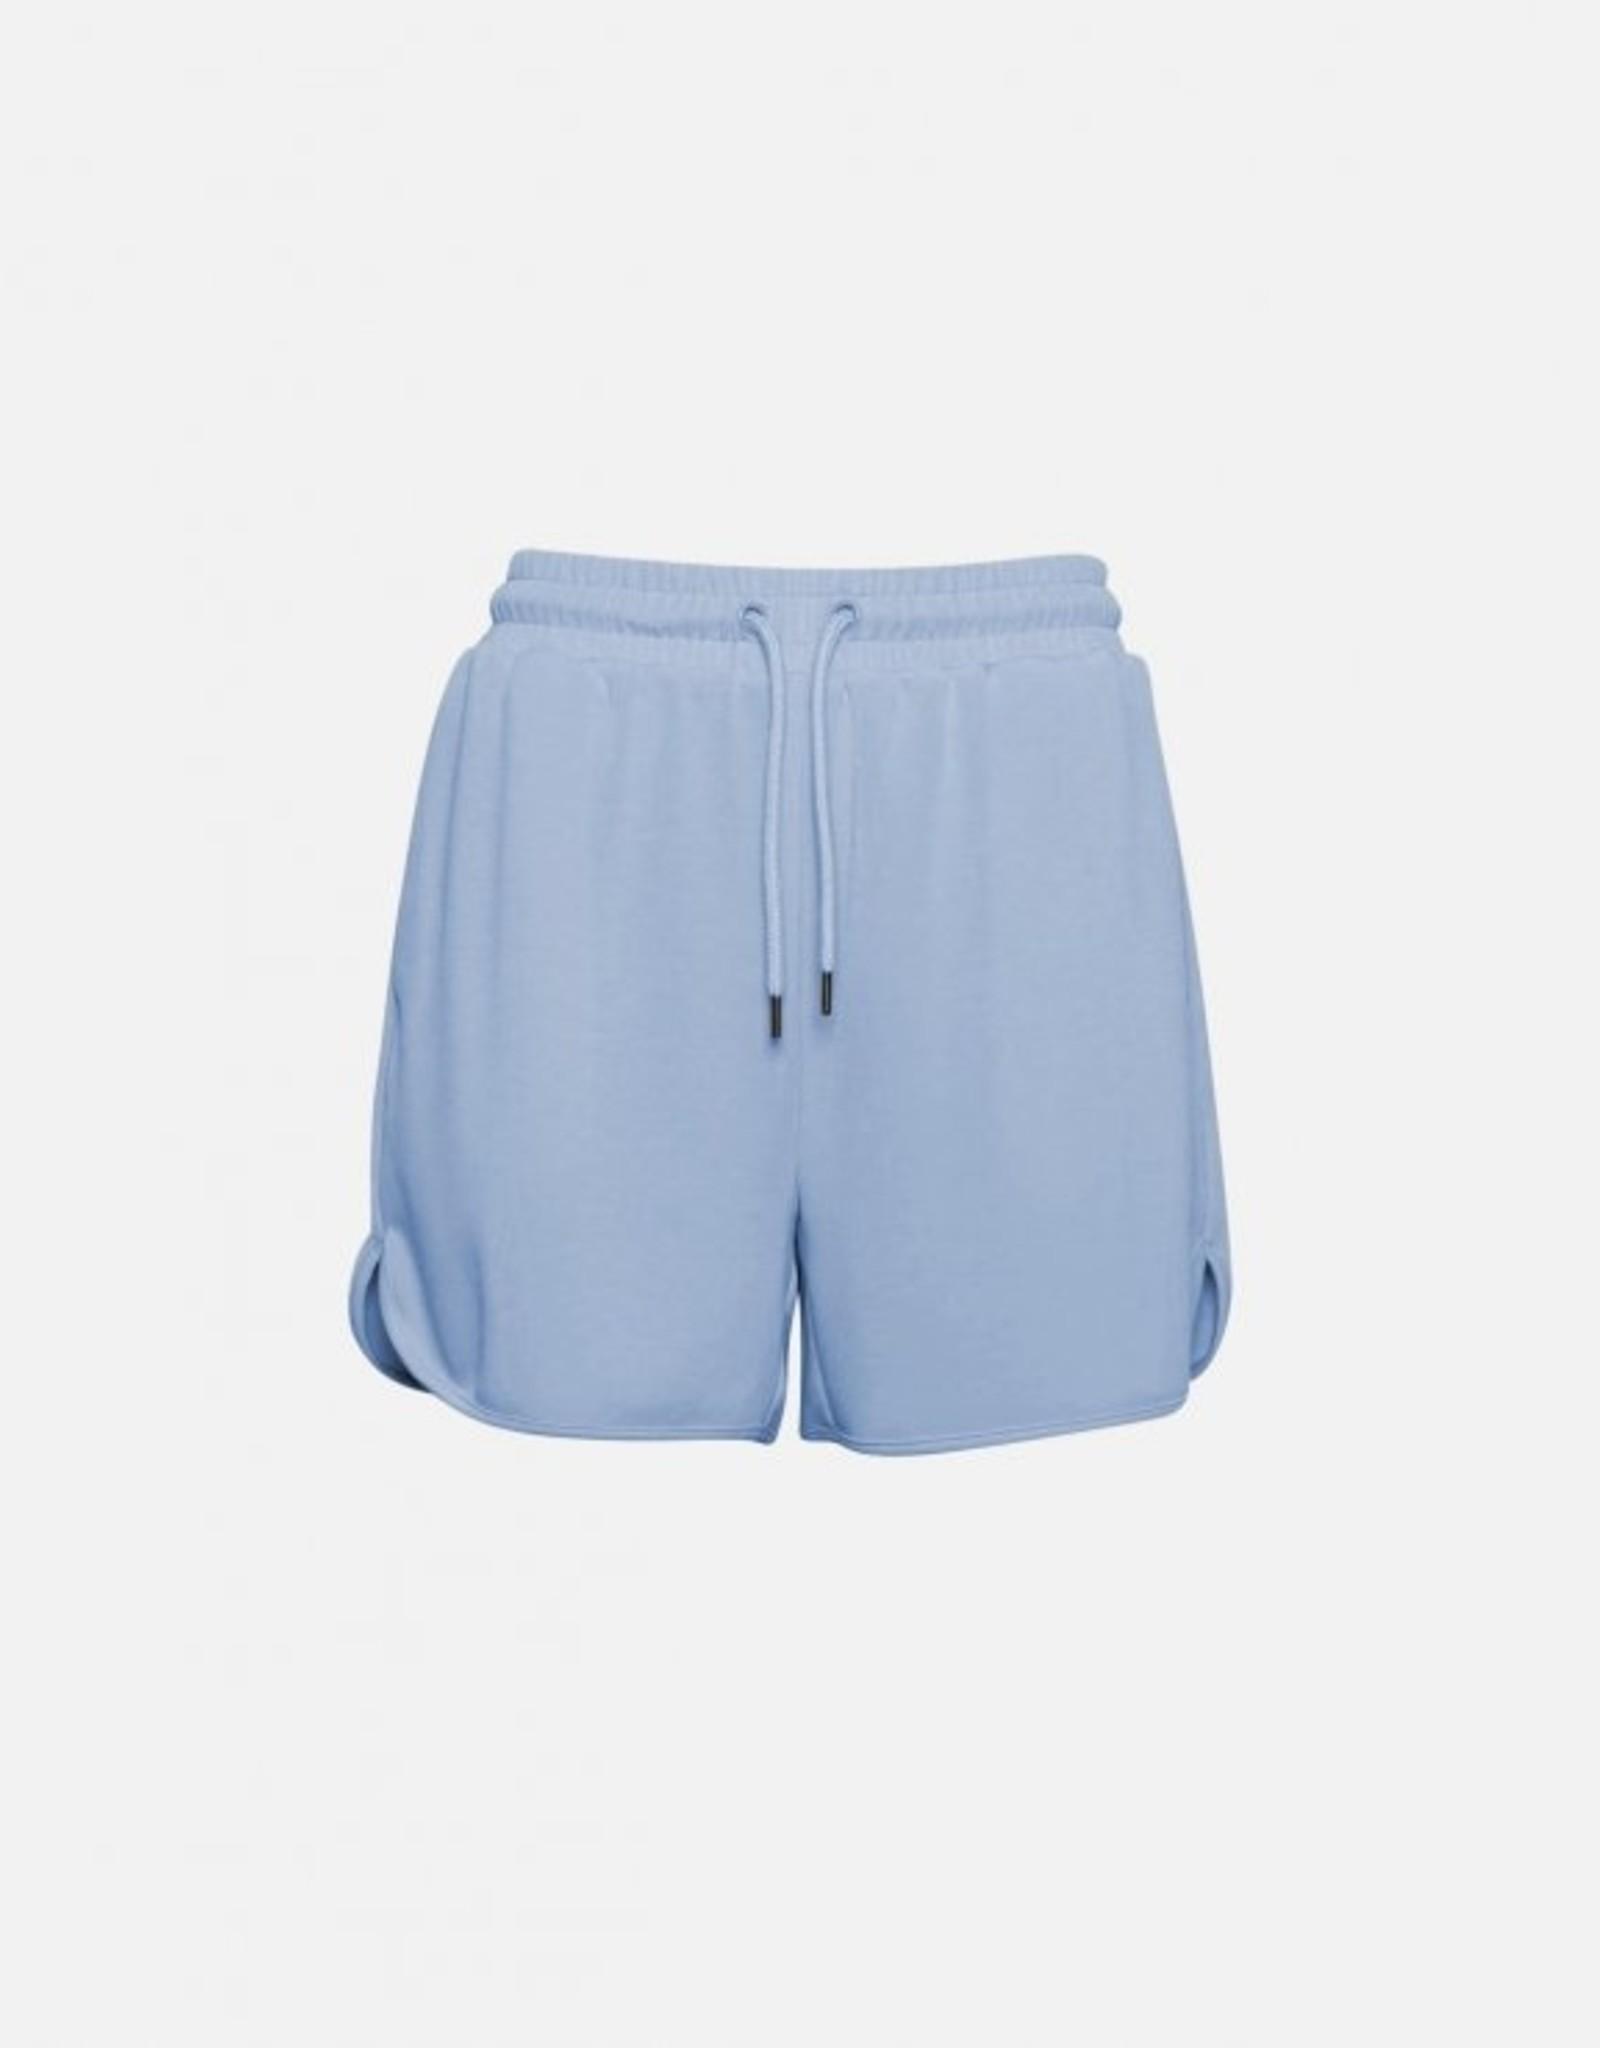 Moss Copenhagen Terisa Merla Shorts Powder Blue